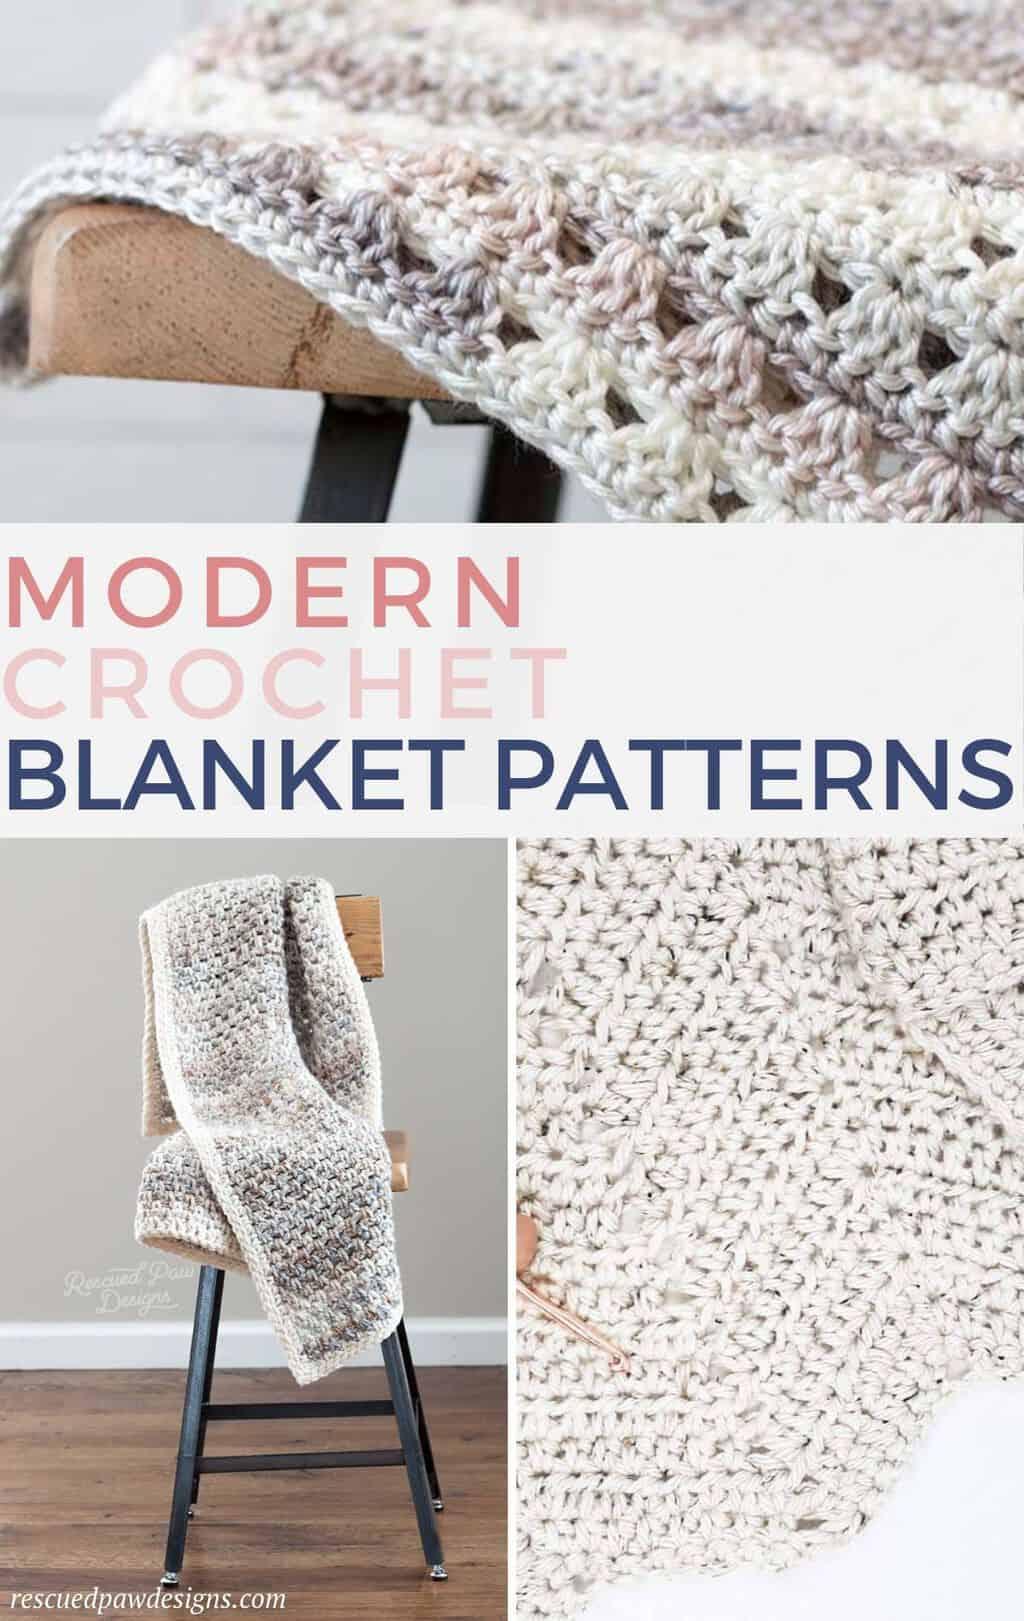 Free Modern Crochet Patterns for Blankets